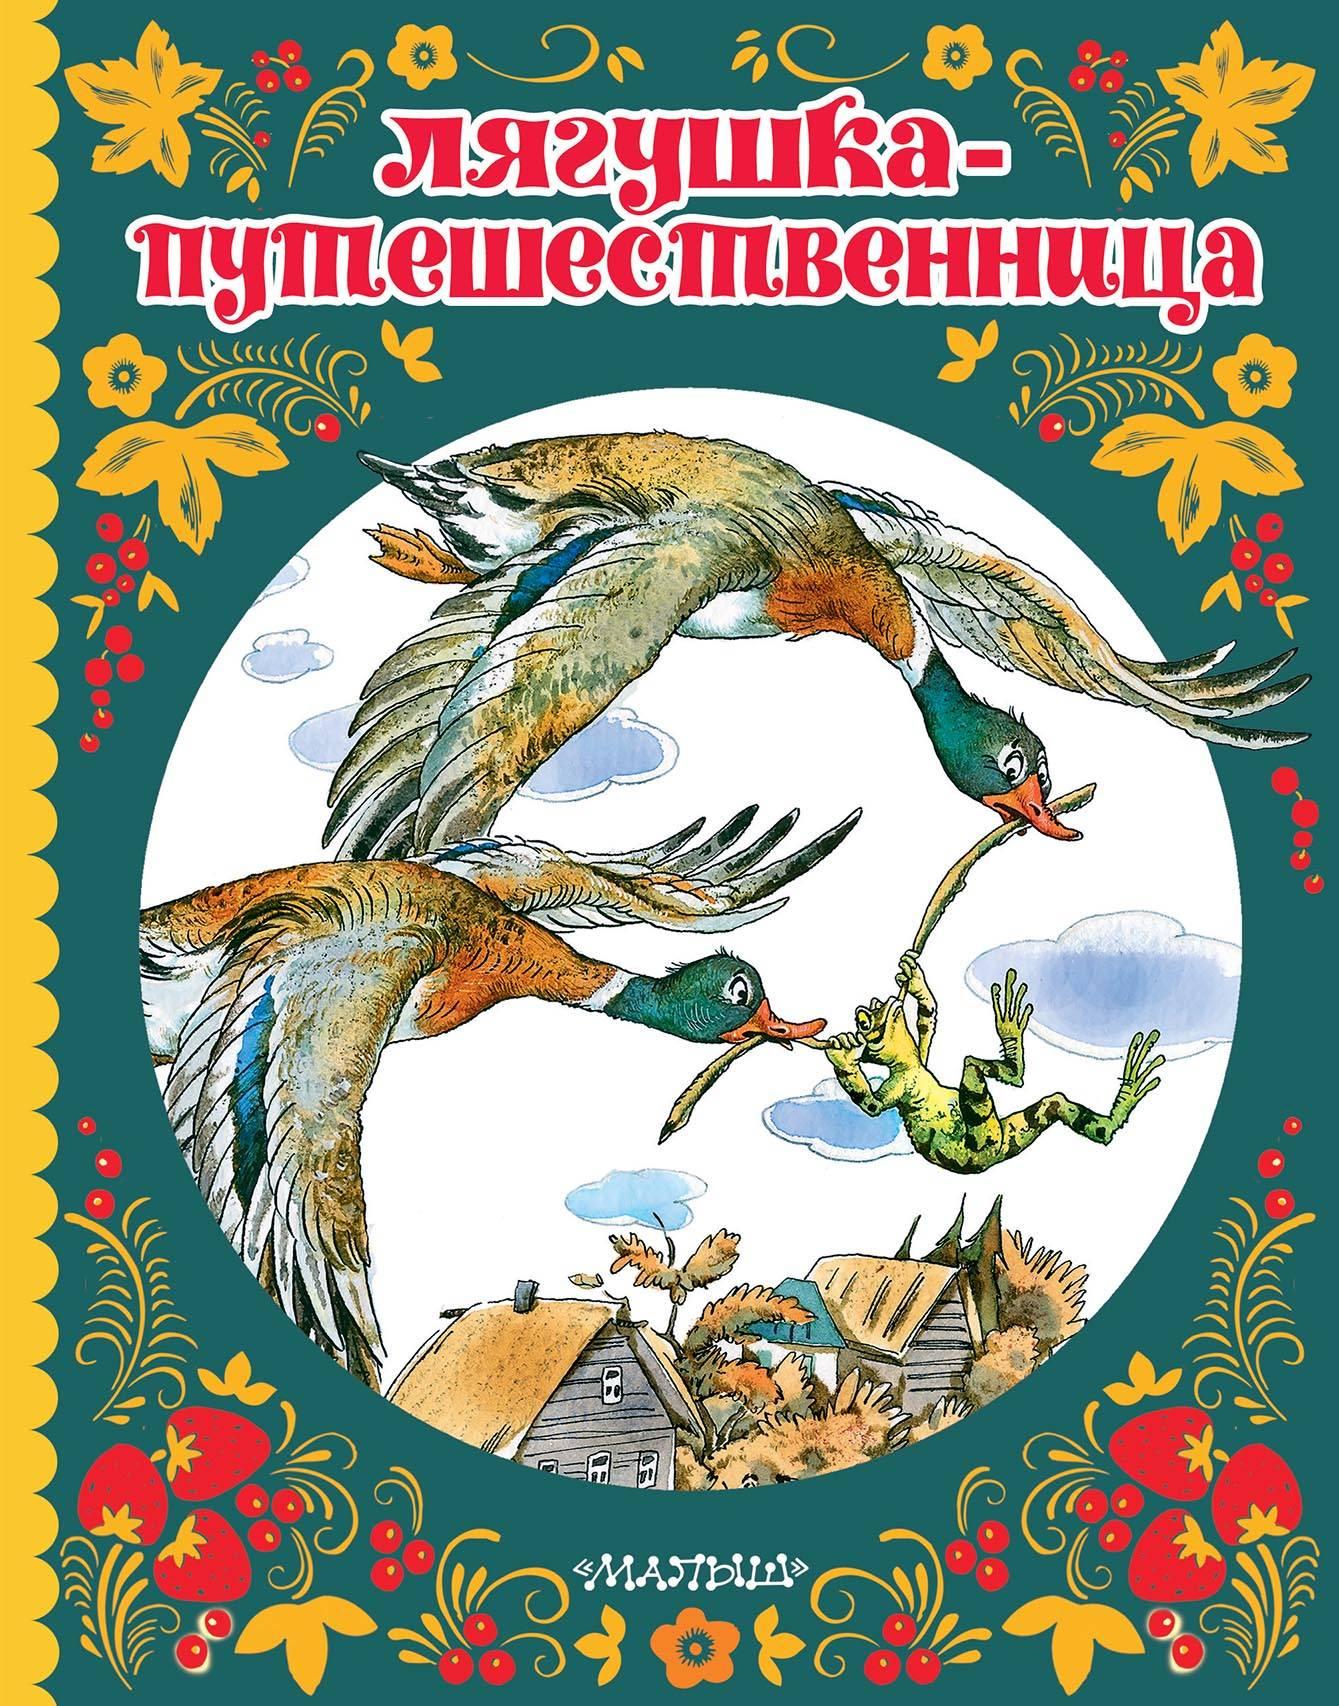 Всеволод Гаршин,Дмитрий Мамин-Сибиряк,Леонид Пантелеев Лягушка-путешественница